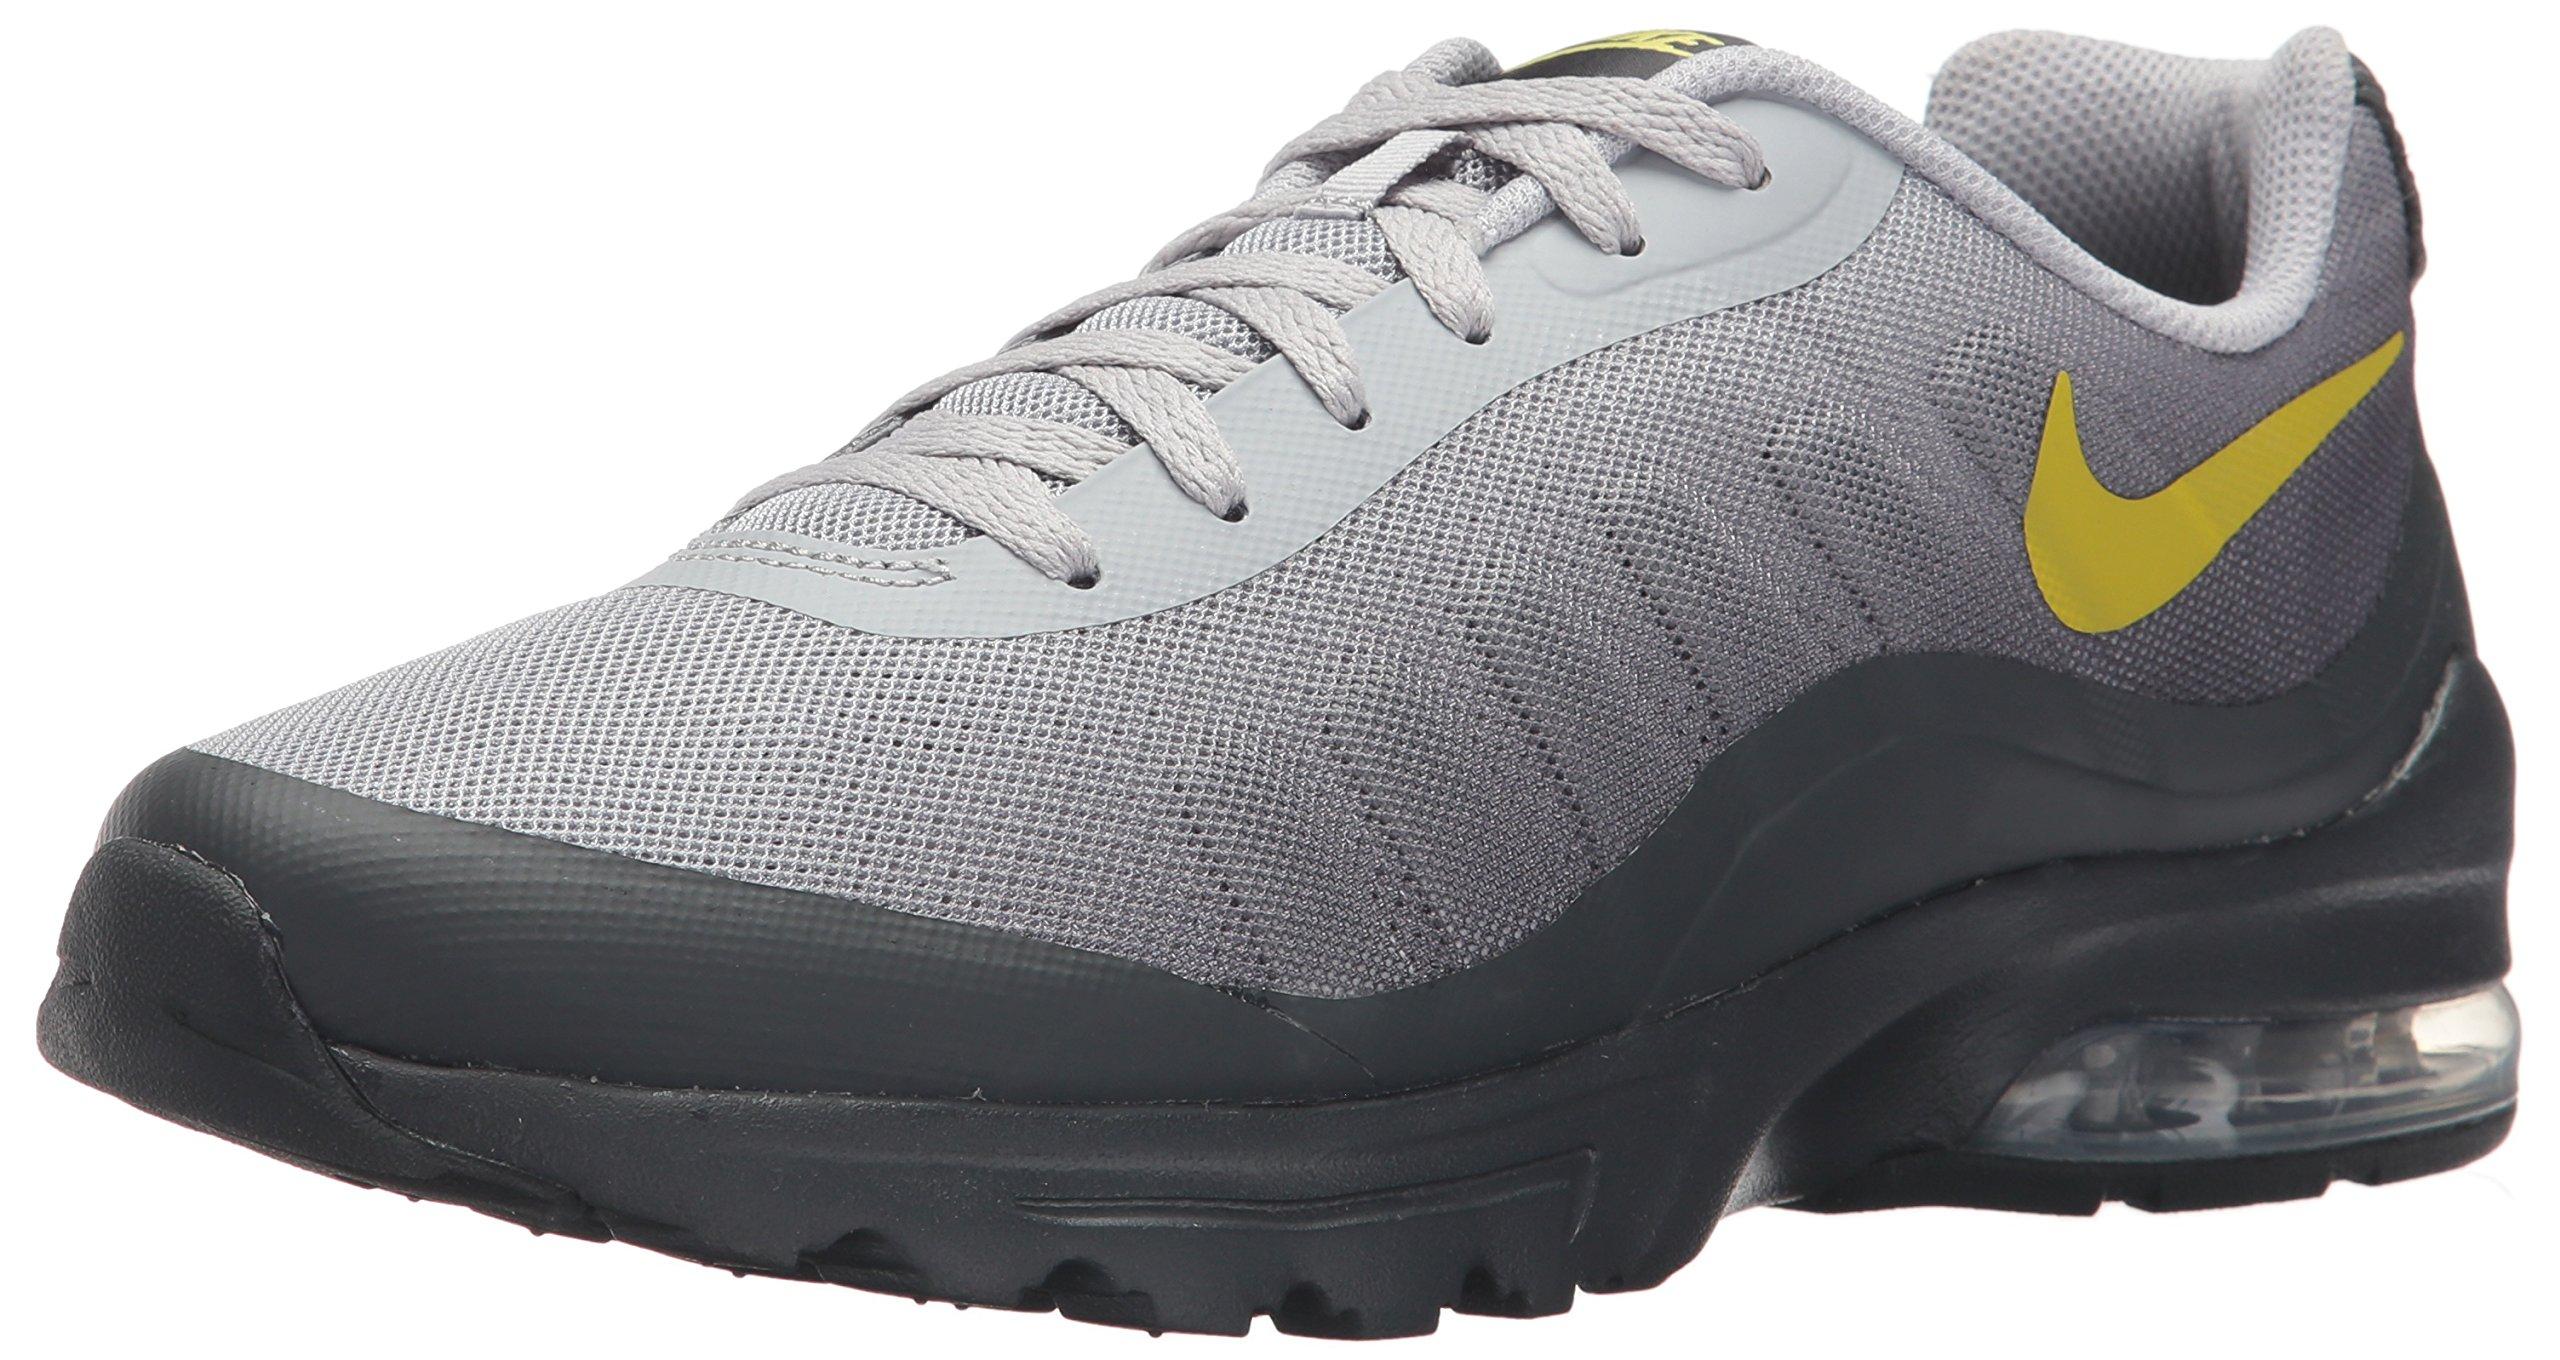 Nike Men's Air Max Invigor Print Running Shoe, Wolf GreyBright CactusAnthracite, 9 D US